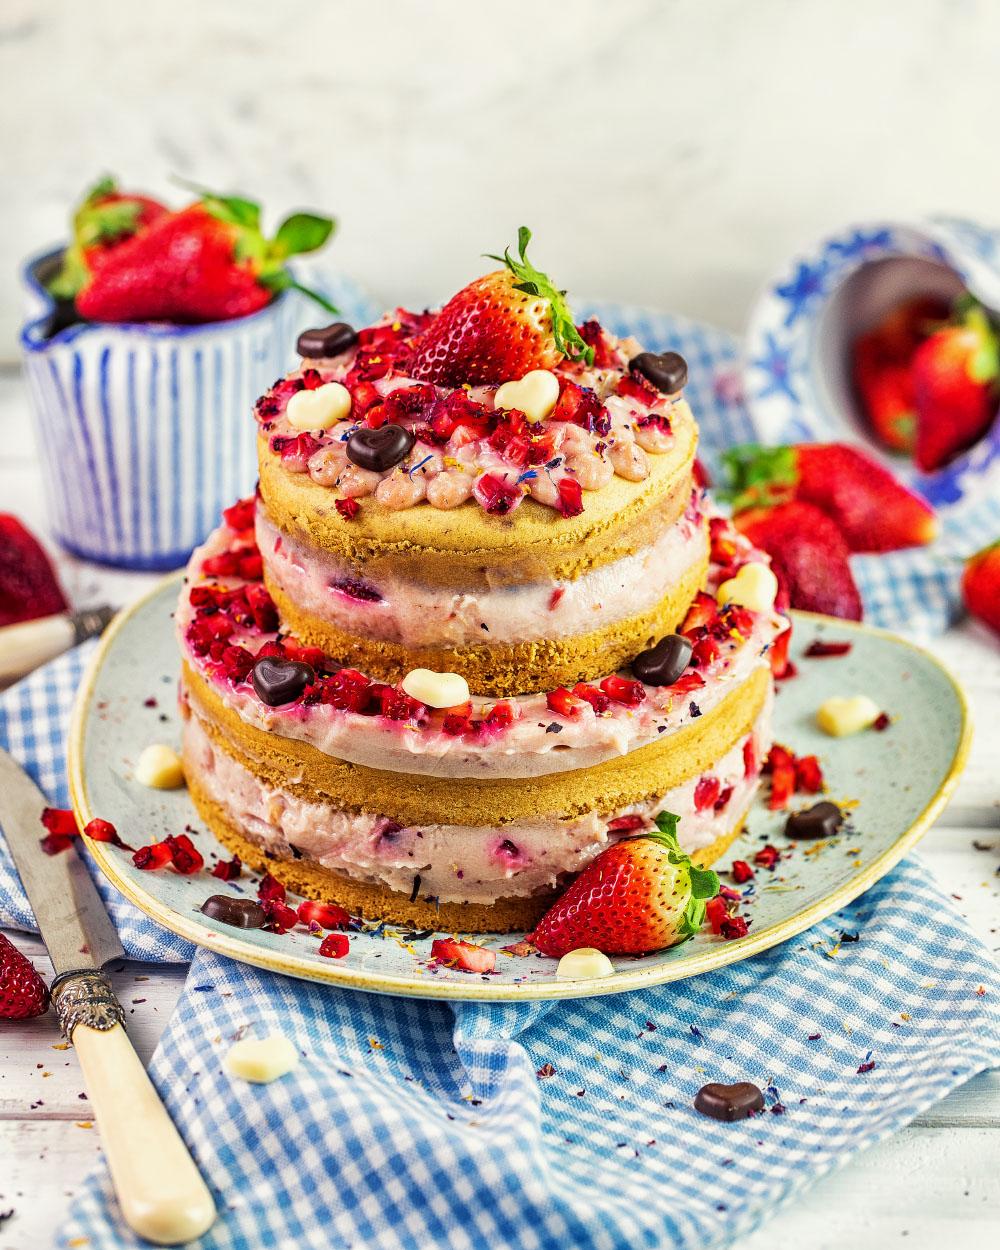 Protein Erdbeer Jogurt Torte einfaches rezept vegan